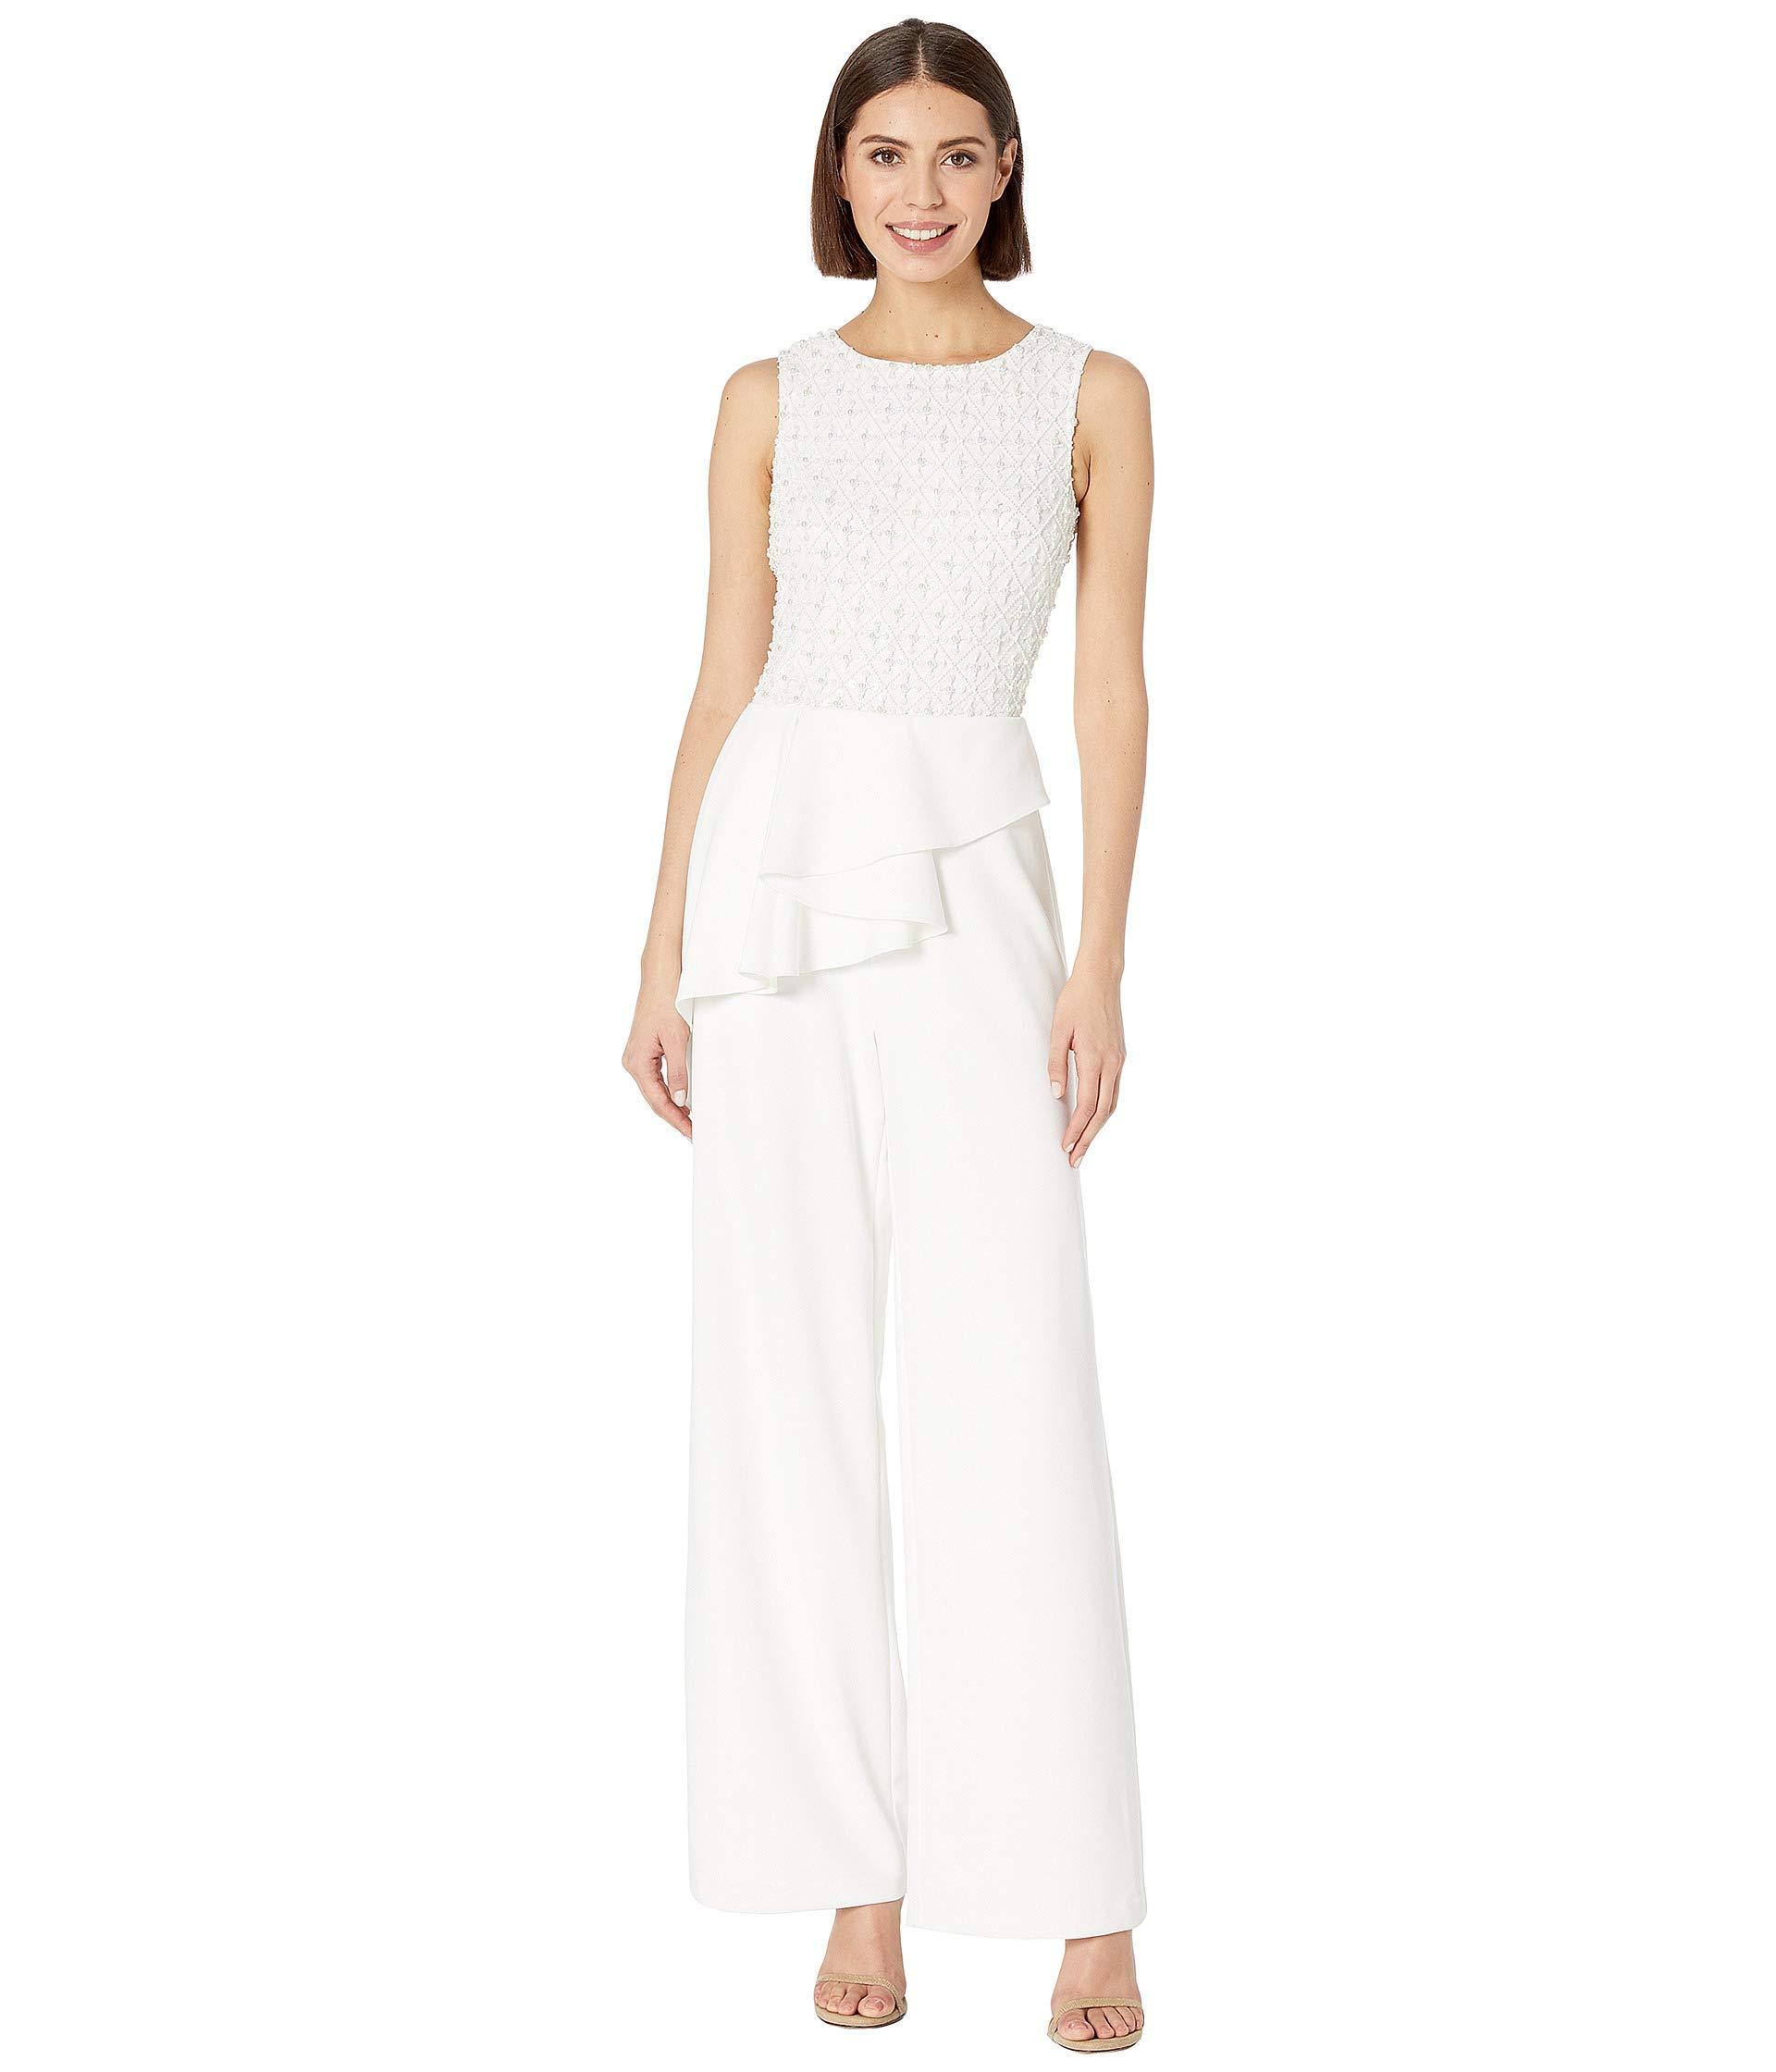 52f586c5c0b2 Adrianna Papell. White Sleeveless Beaded Bodice Knit Crepe Jumpsuit With  Peplum (ivory) ...